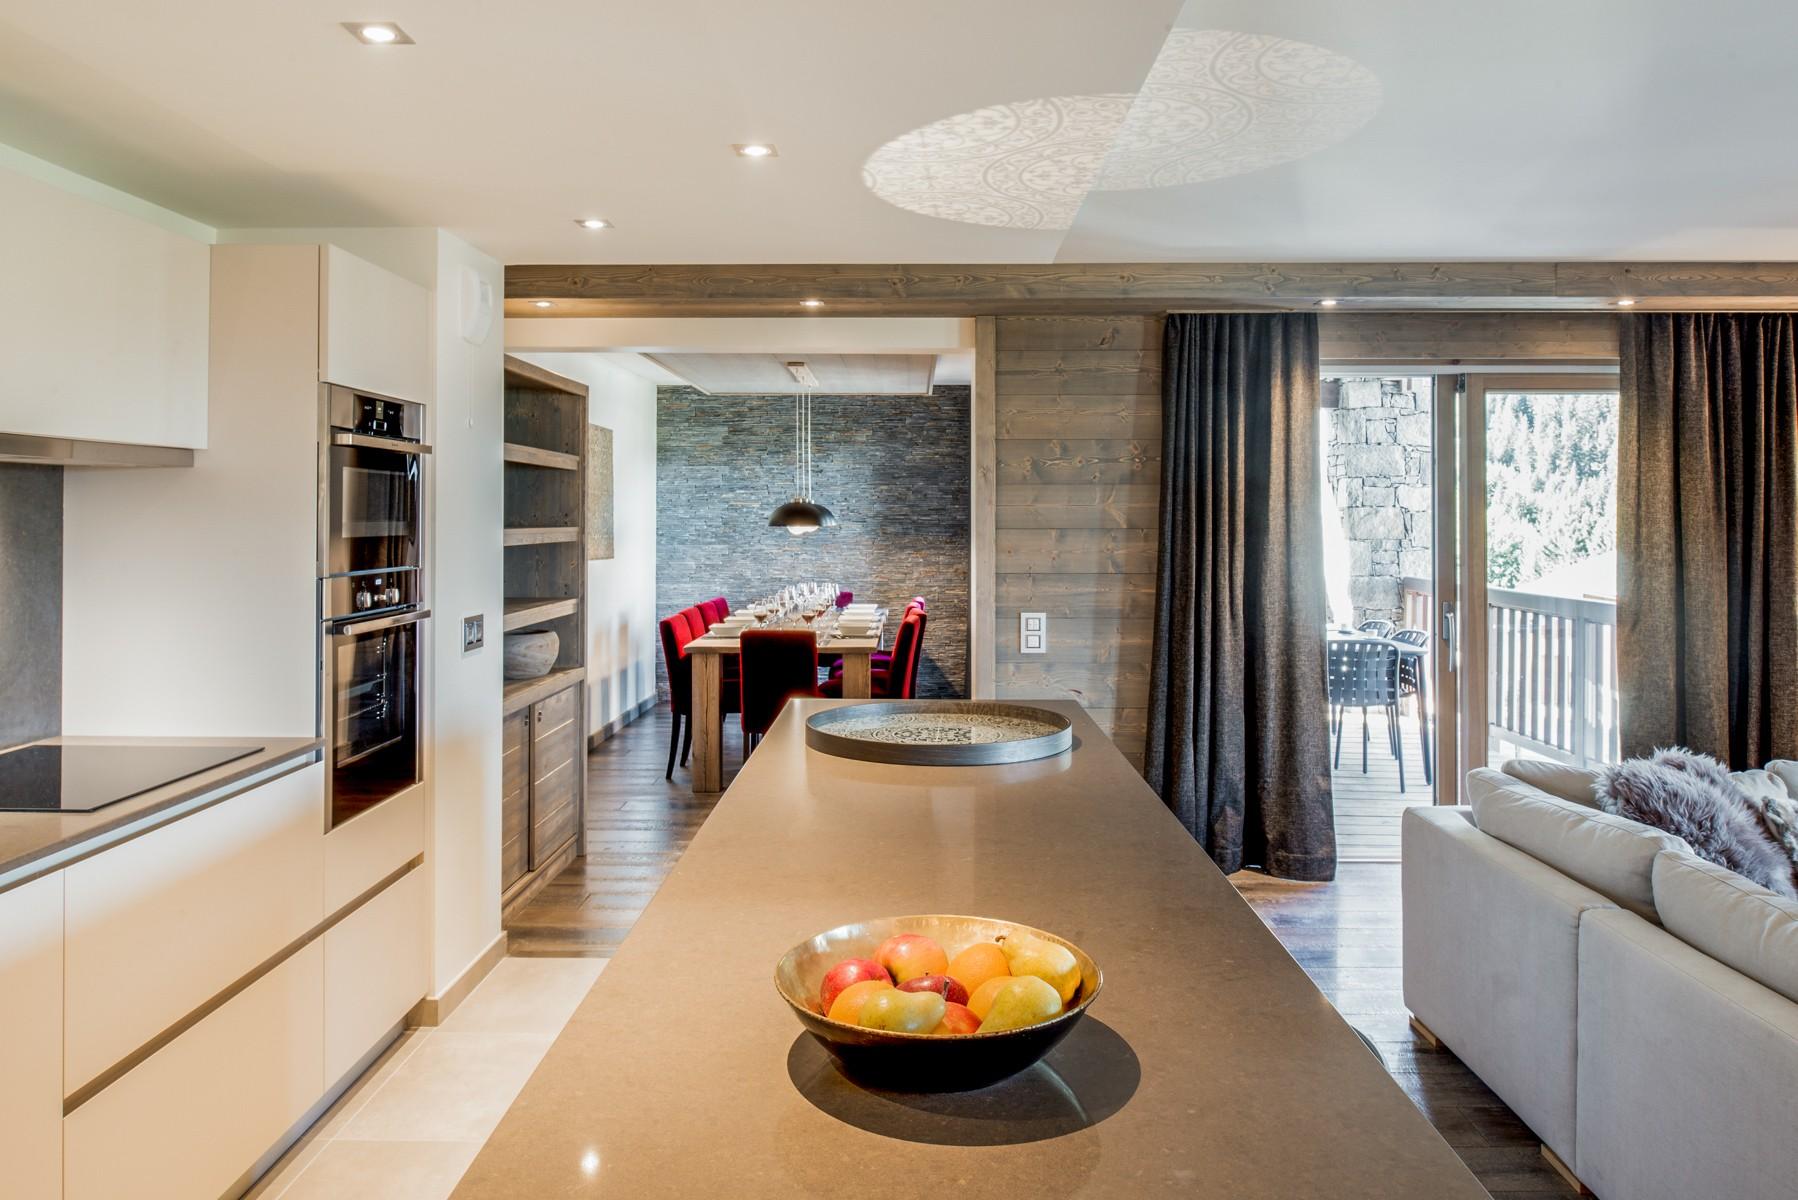 Courchevel 1650 Location Appartement Luxe Amurile Cuisine